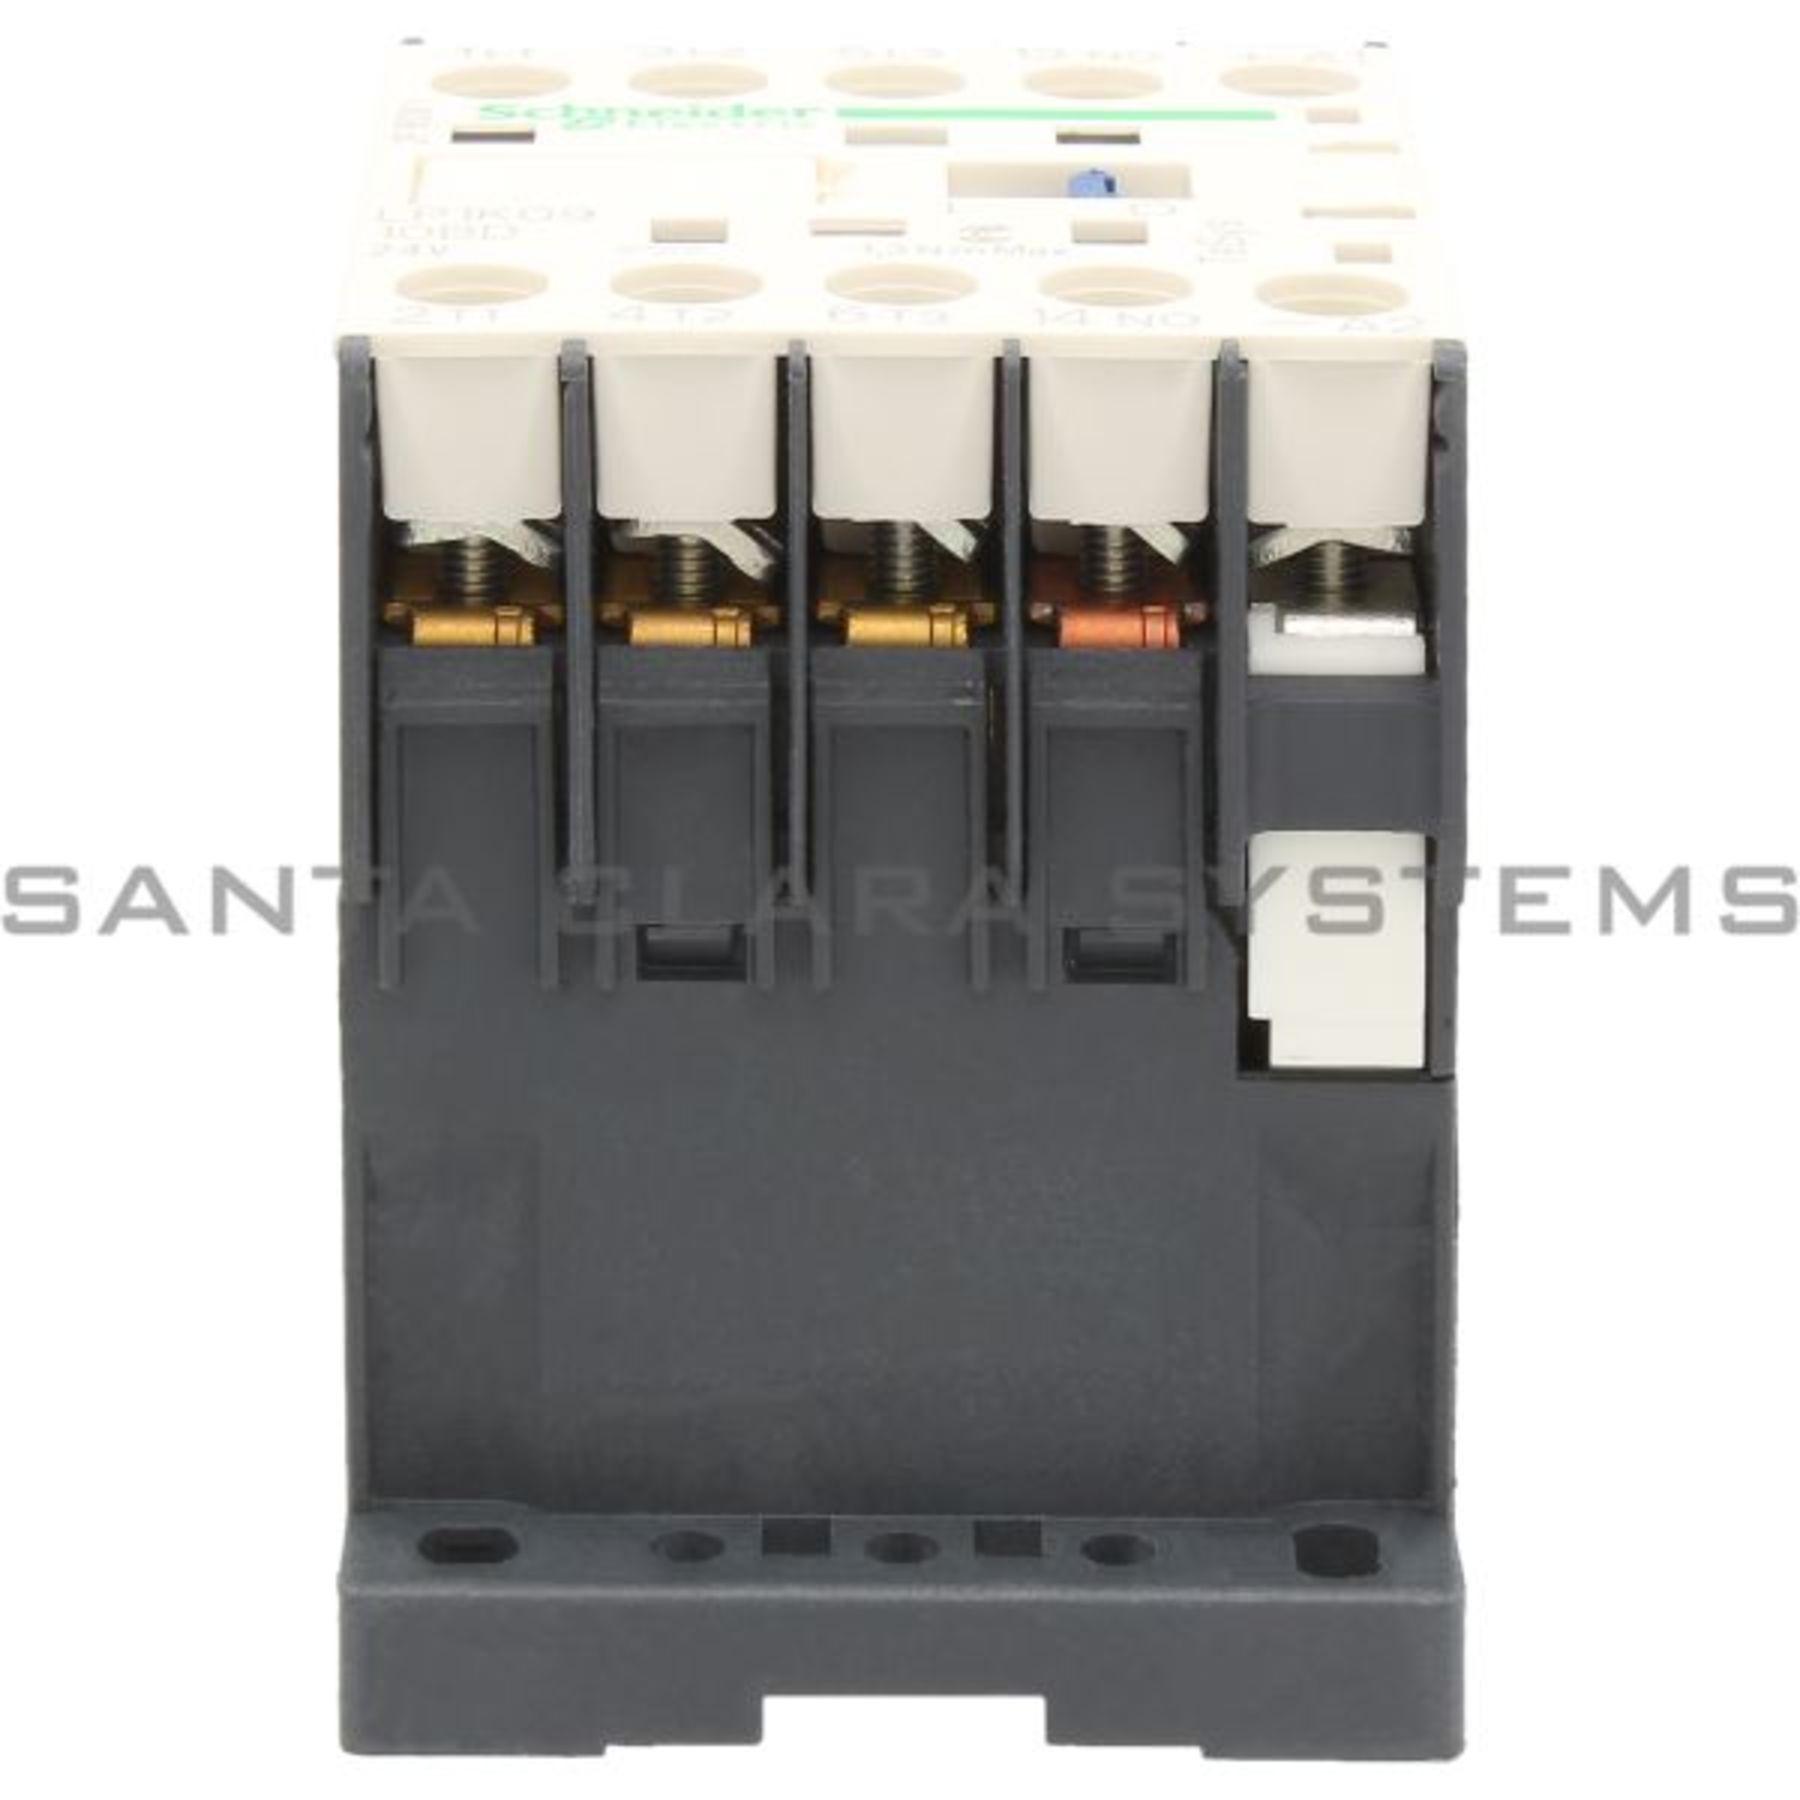 Details about  /SQUARE D TELEMECANIQUE LP1K09-10BD3 LP1K0910BD3 20A 690V 8kV 24V CONTACTOR